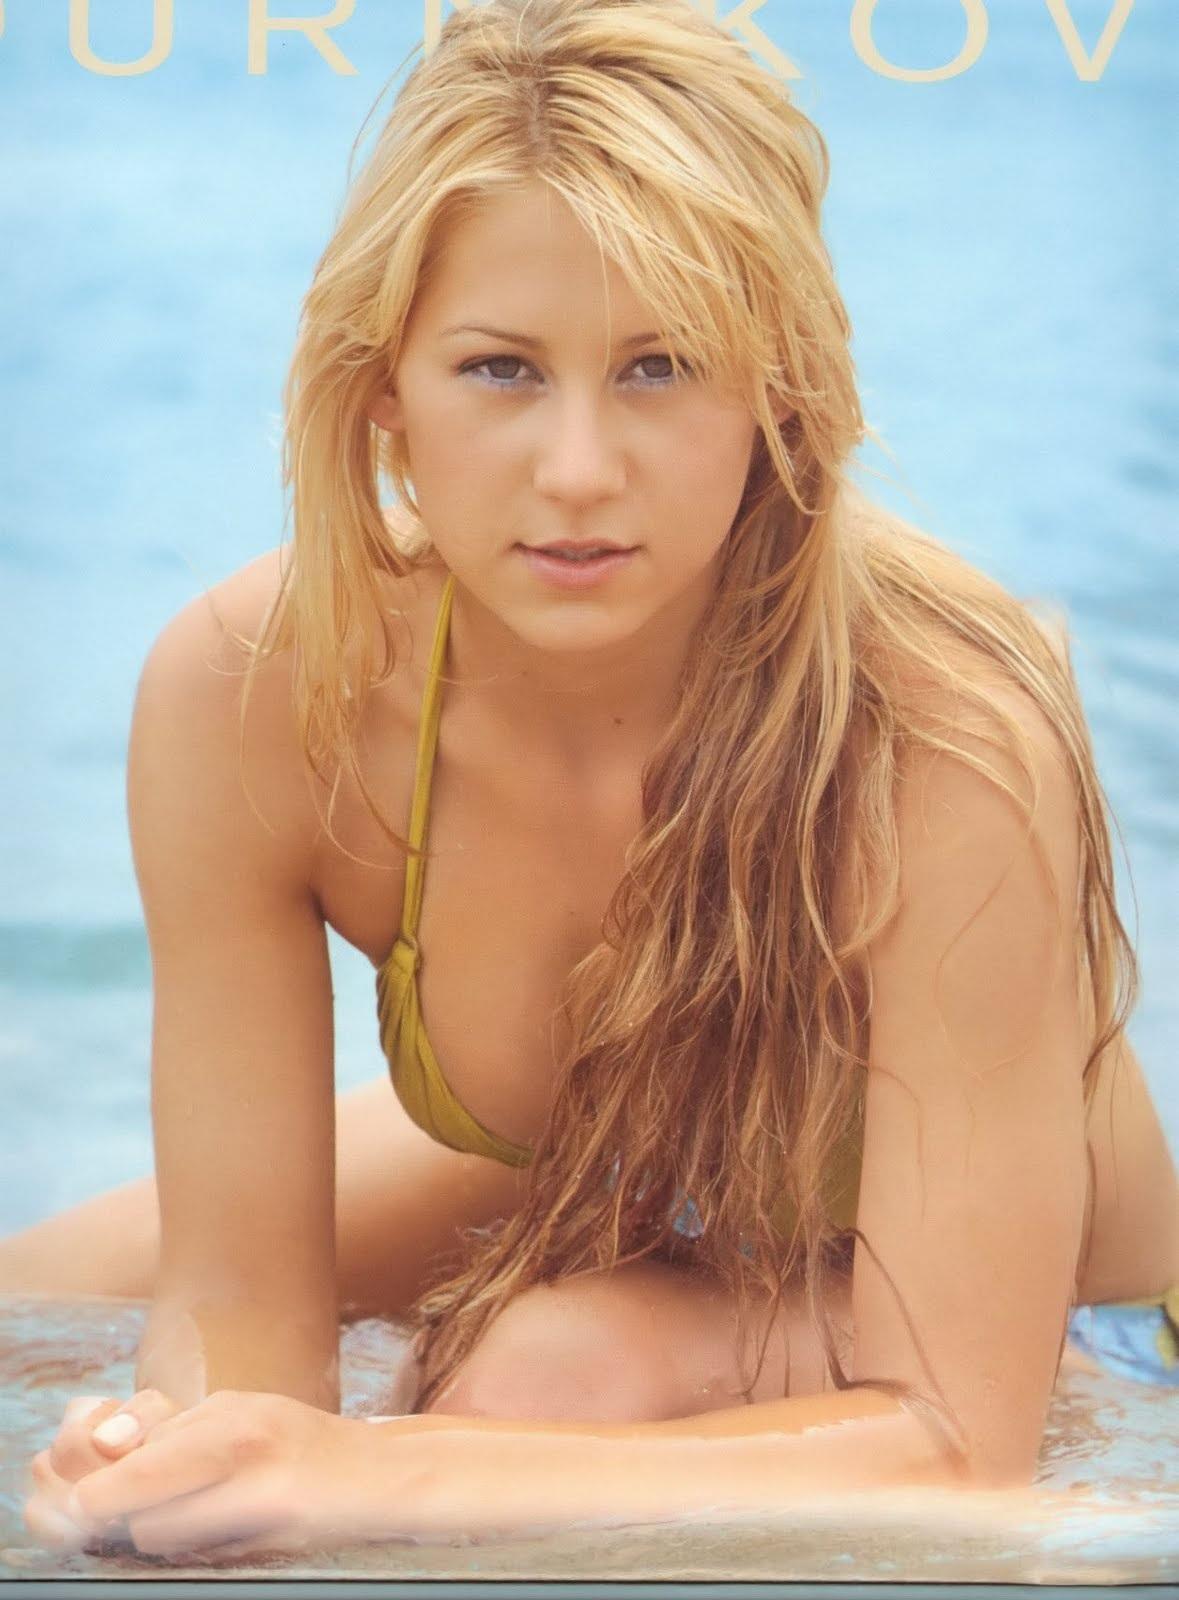 nipples-nude-hot-anna-kournikova-in-nude